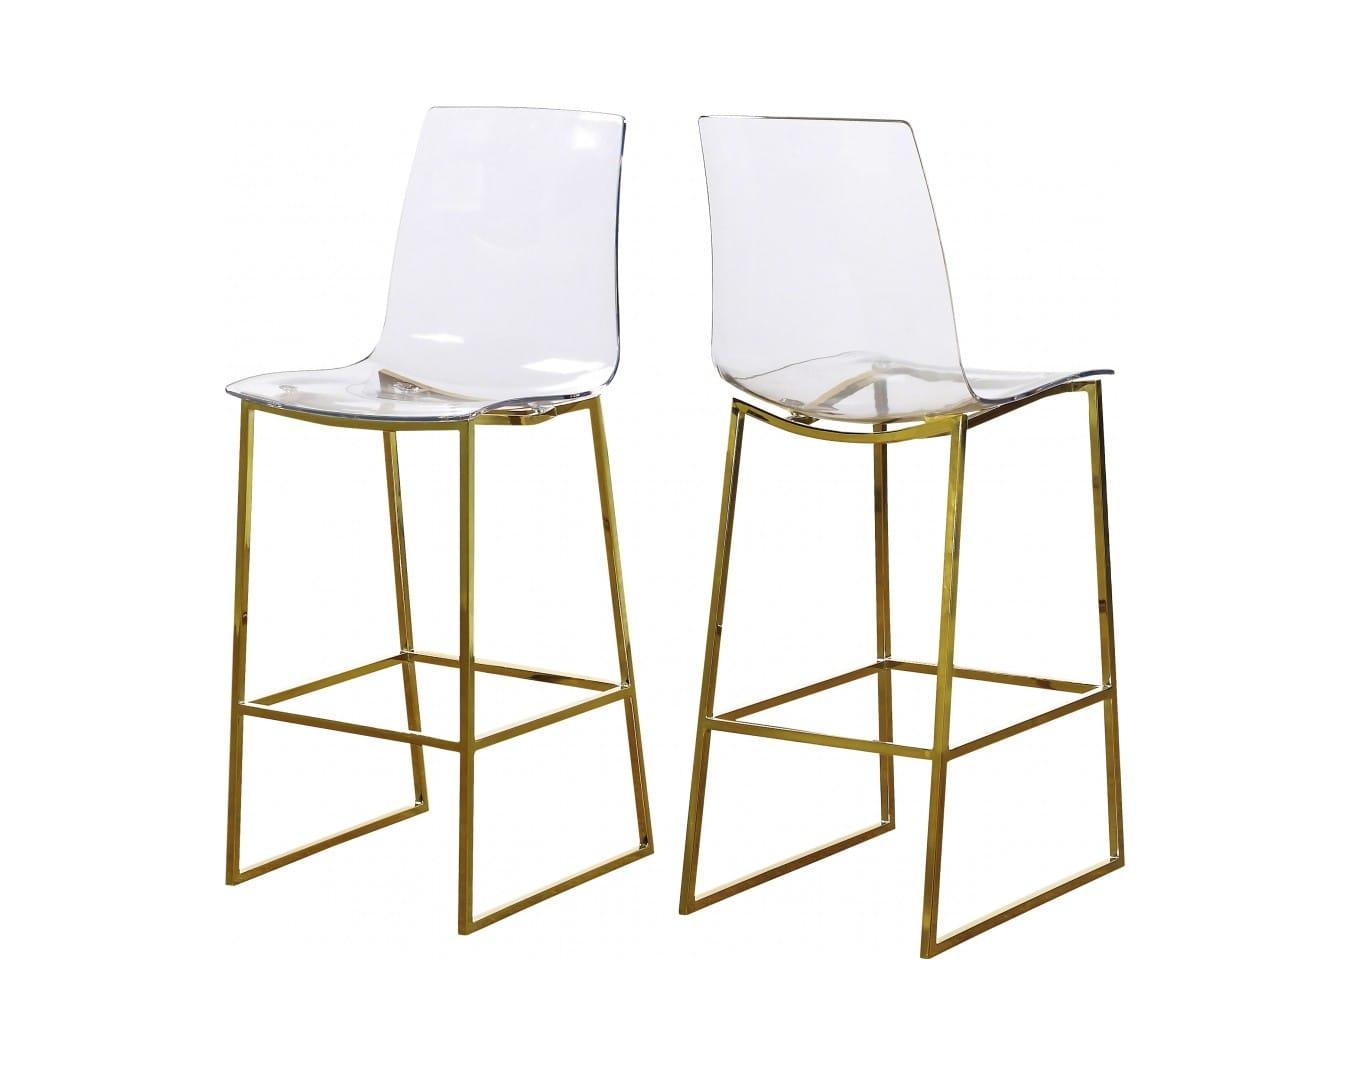 Incredible Lumen Gold Counter Stool Set Of 2 By Meridian Furniture Inzonedesignstudio Interior Chair Design Inzonedesignstudiocom